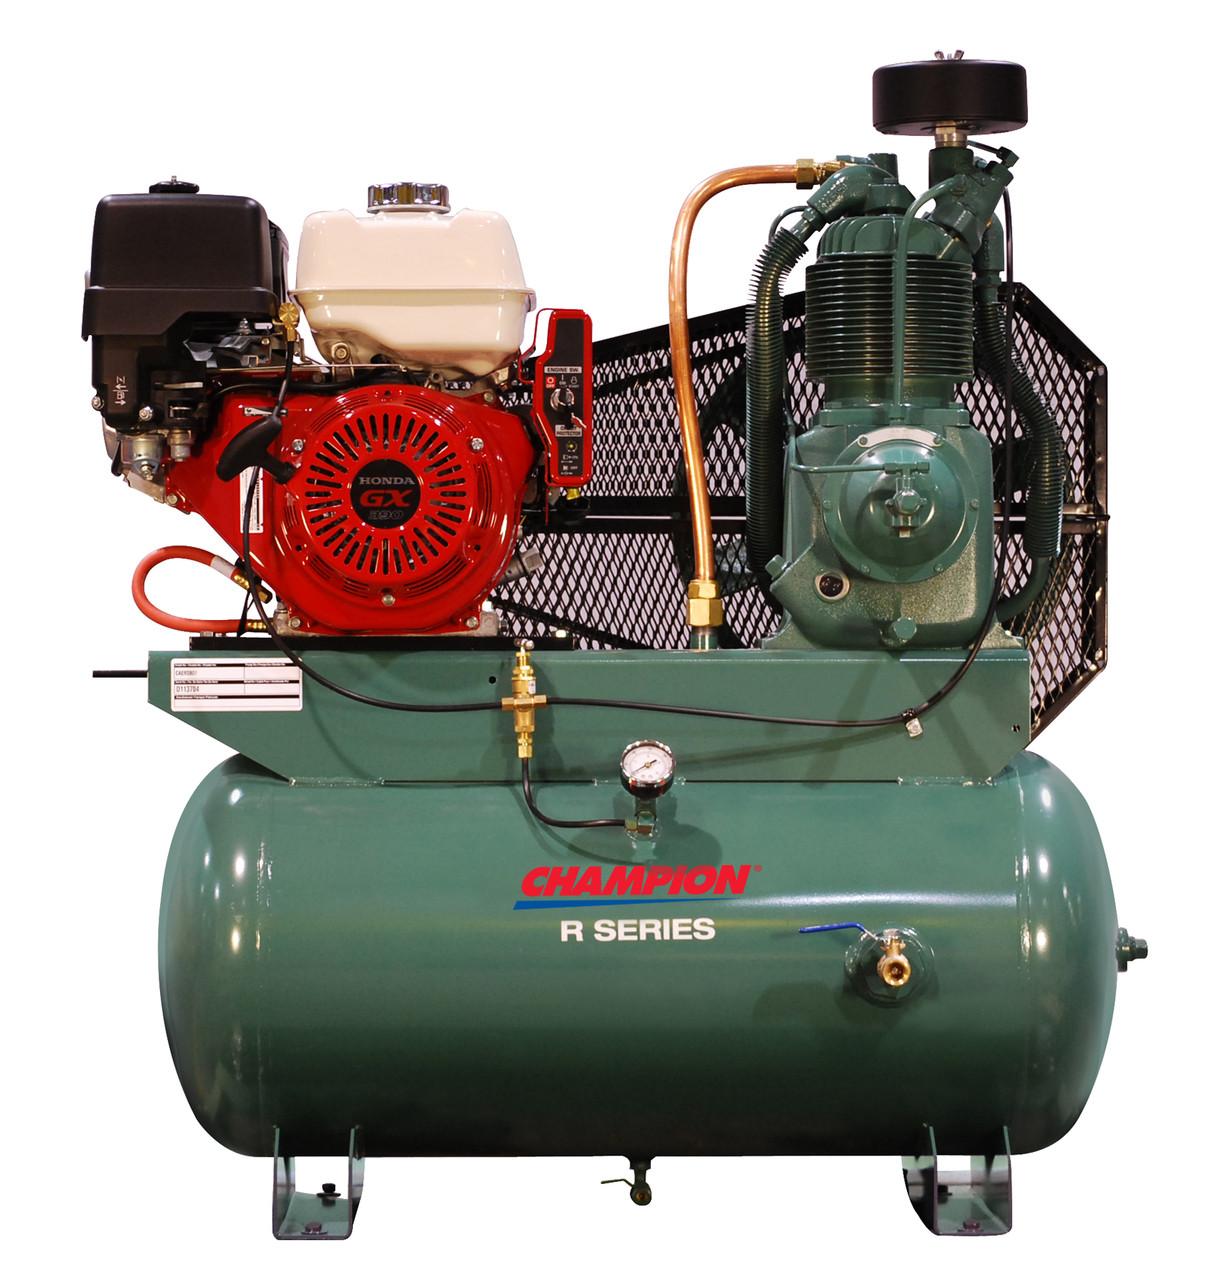 Champion HGR7-3H 13 HP, 30 Gallon Air Compressor (Honda Engine)